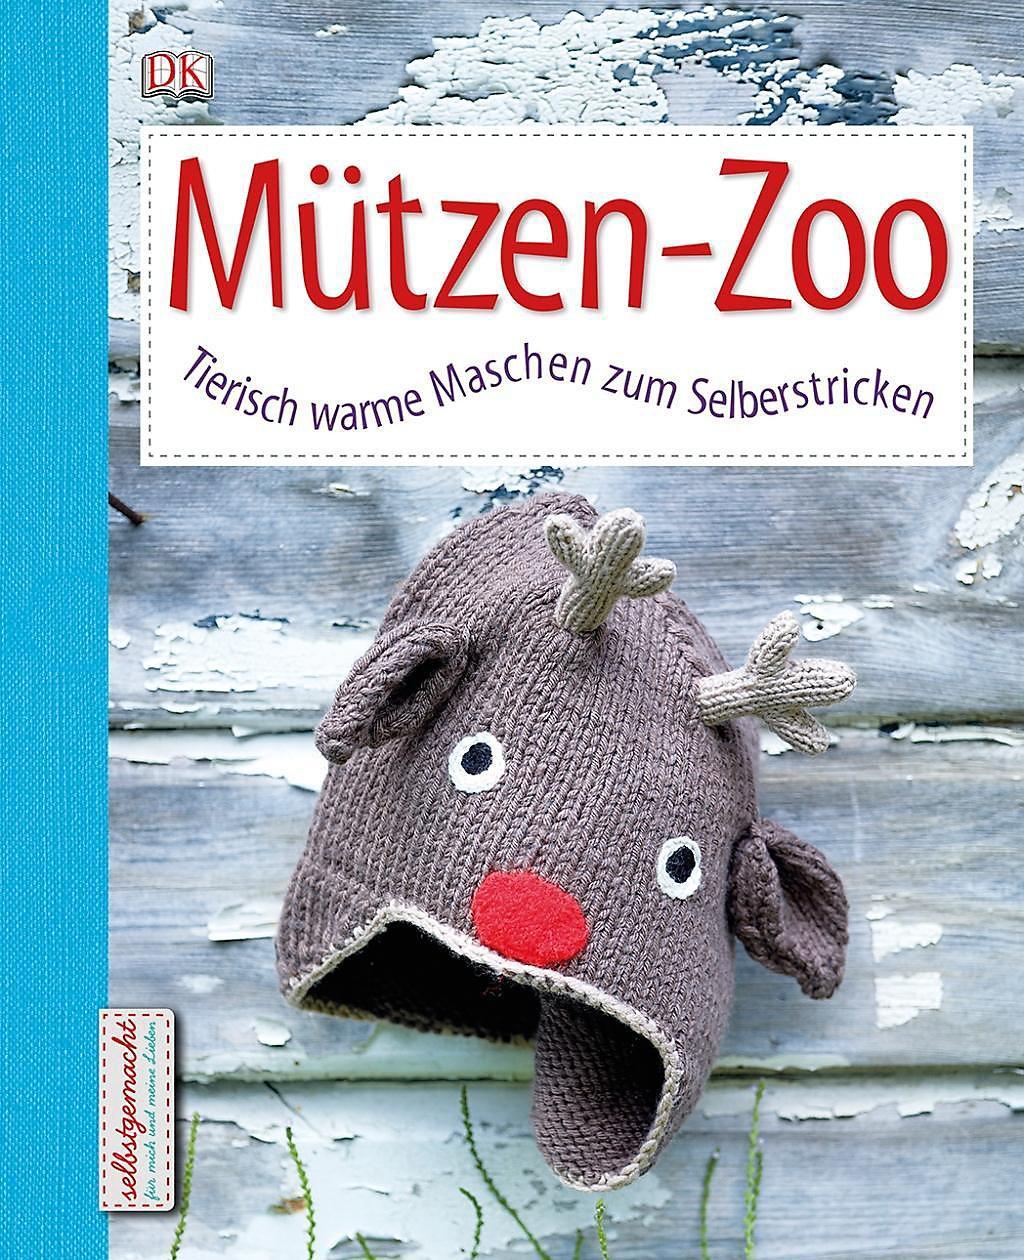 Mützen Zoo Buch Jetzt Portofrei Bei Weltbildde Bestellen